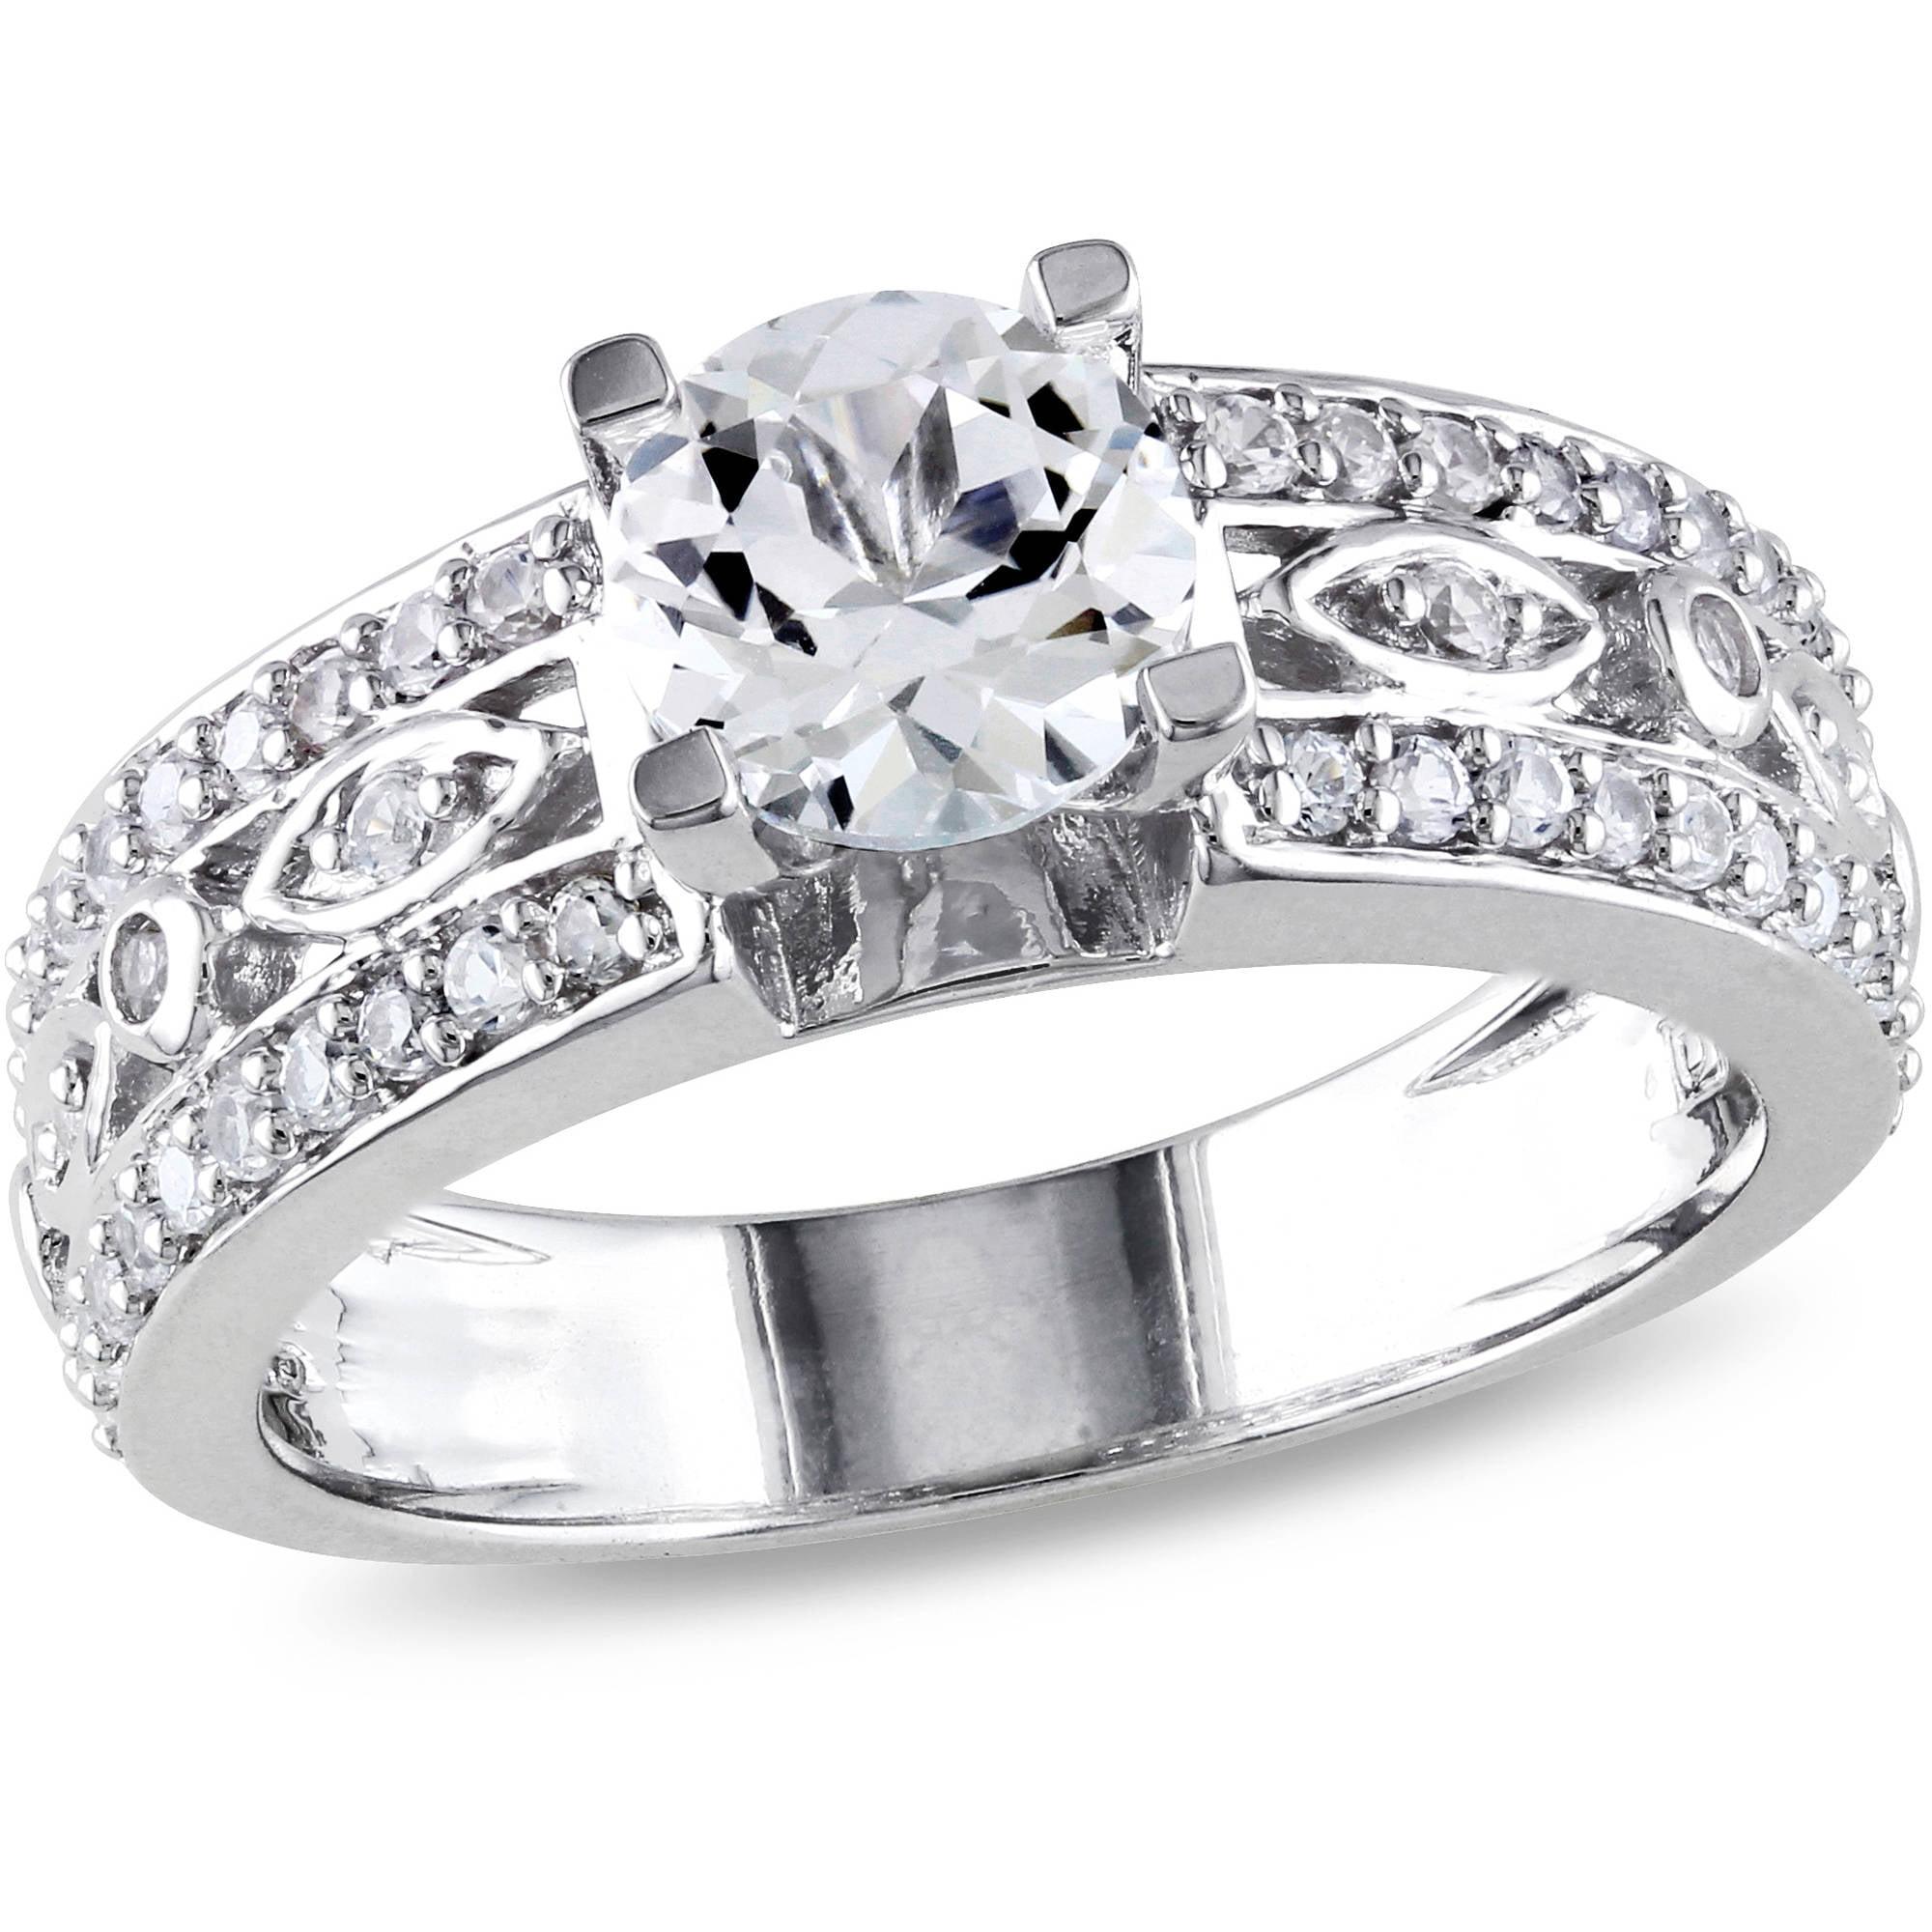 Miabella 12 Carat Tw Diamond 10kt White Gold Five Stone Engagement Ring Walmart: Best Looking 2 Carat Wedding Rings At Websimilar.org